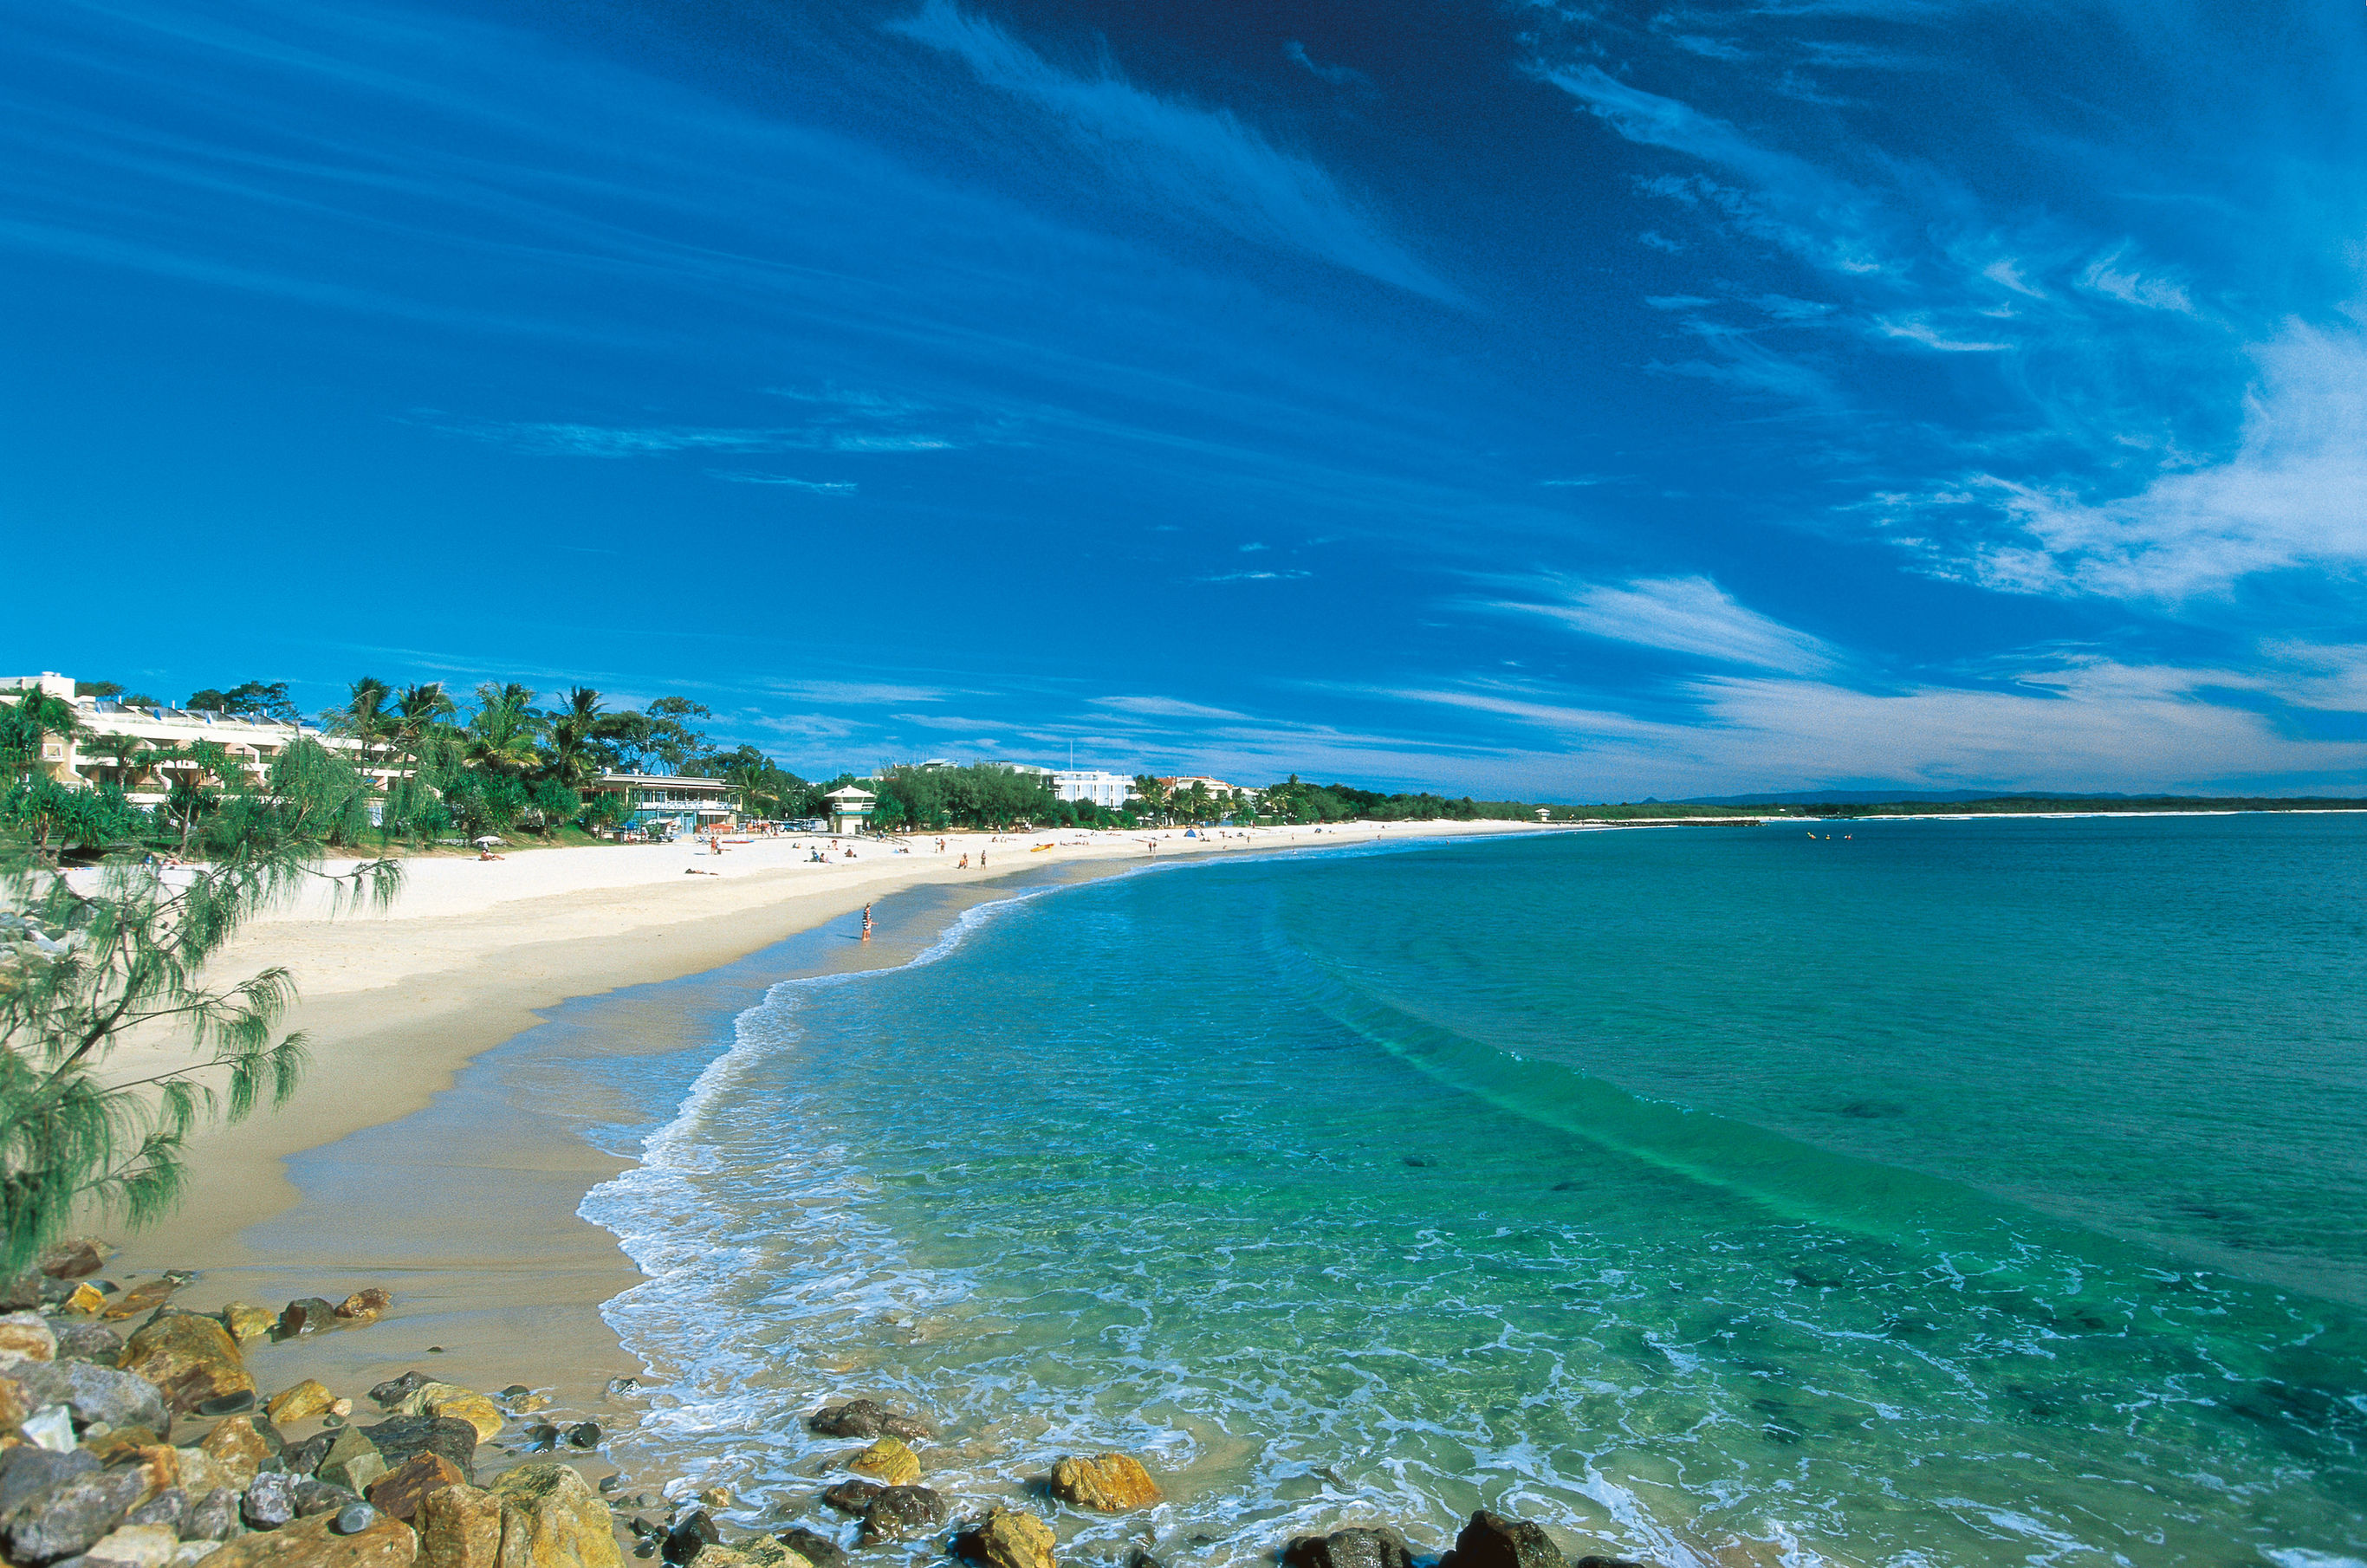 Australie-Noosa-main-beach_2_560168 China